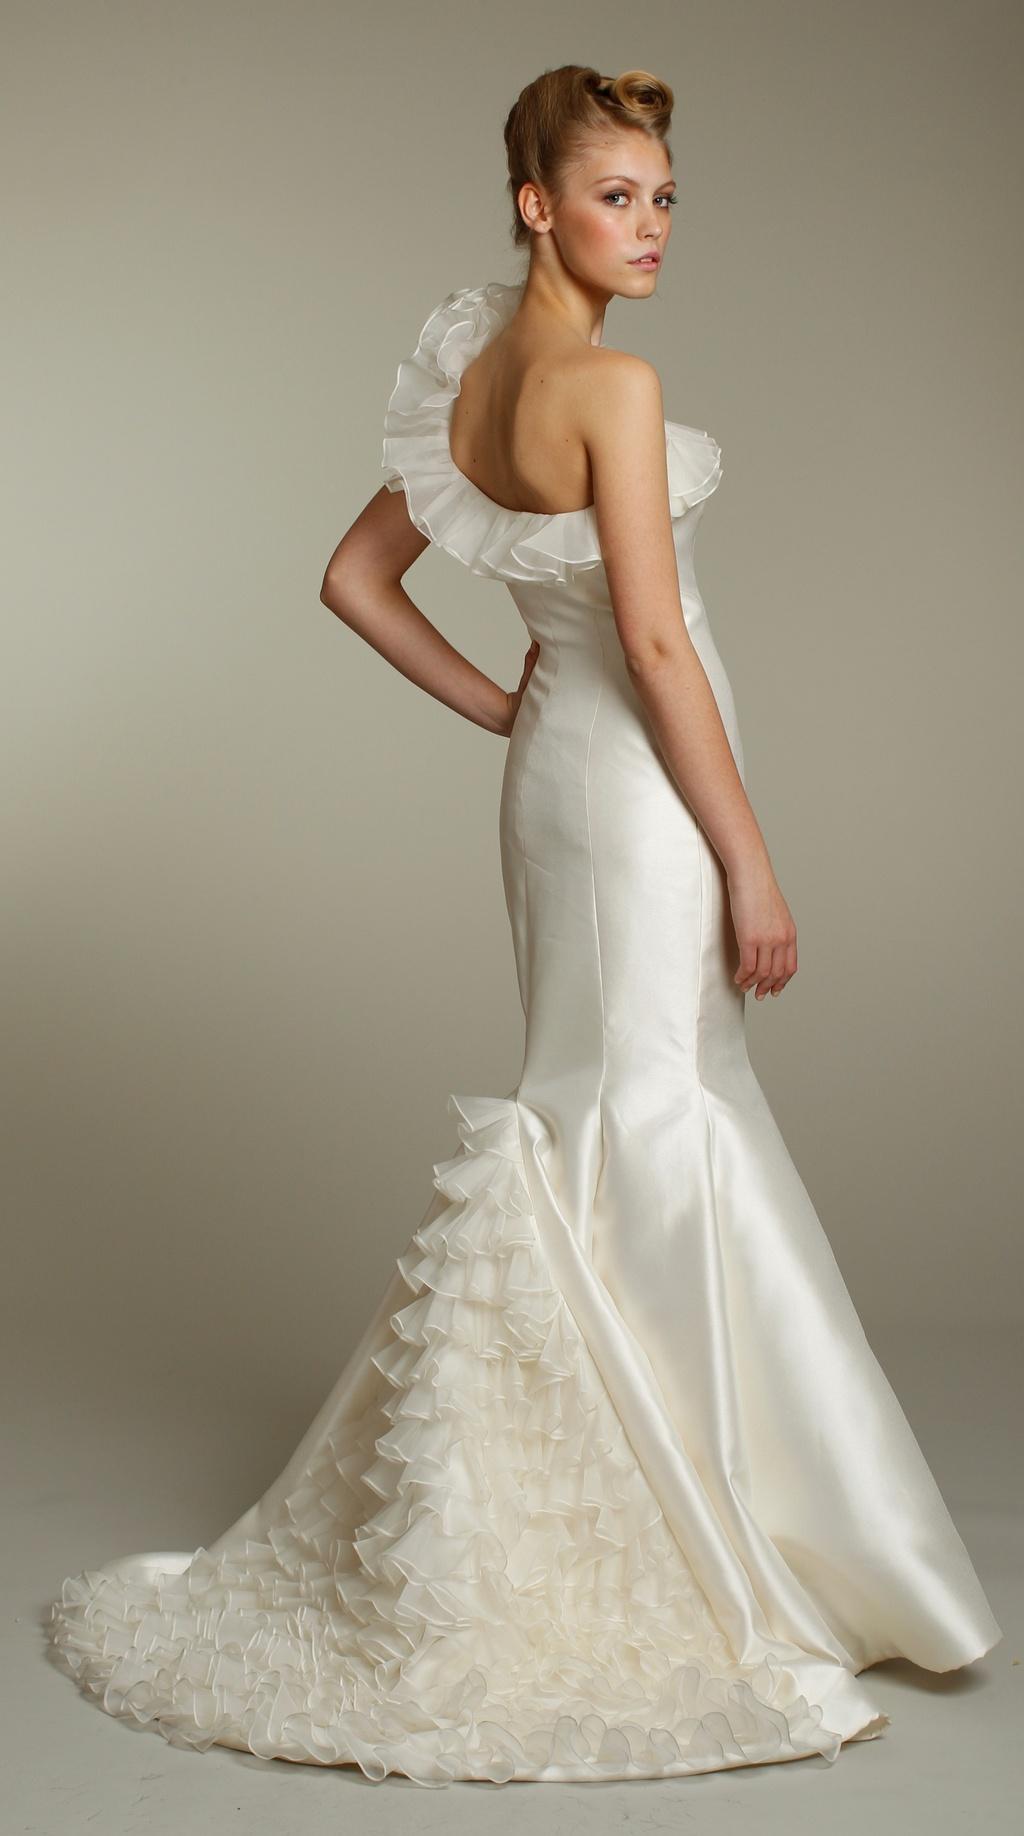 2156-wedding-dress-2011-bridal-gowns-mermaid-one-shoulder-ruffles-back.full